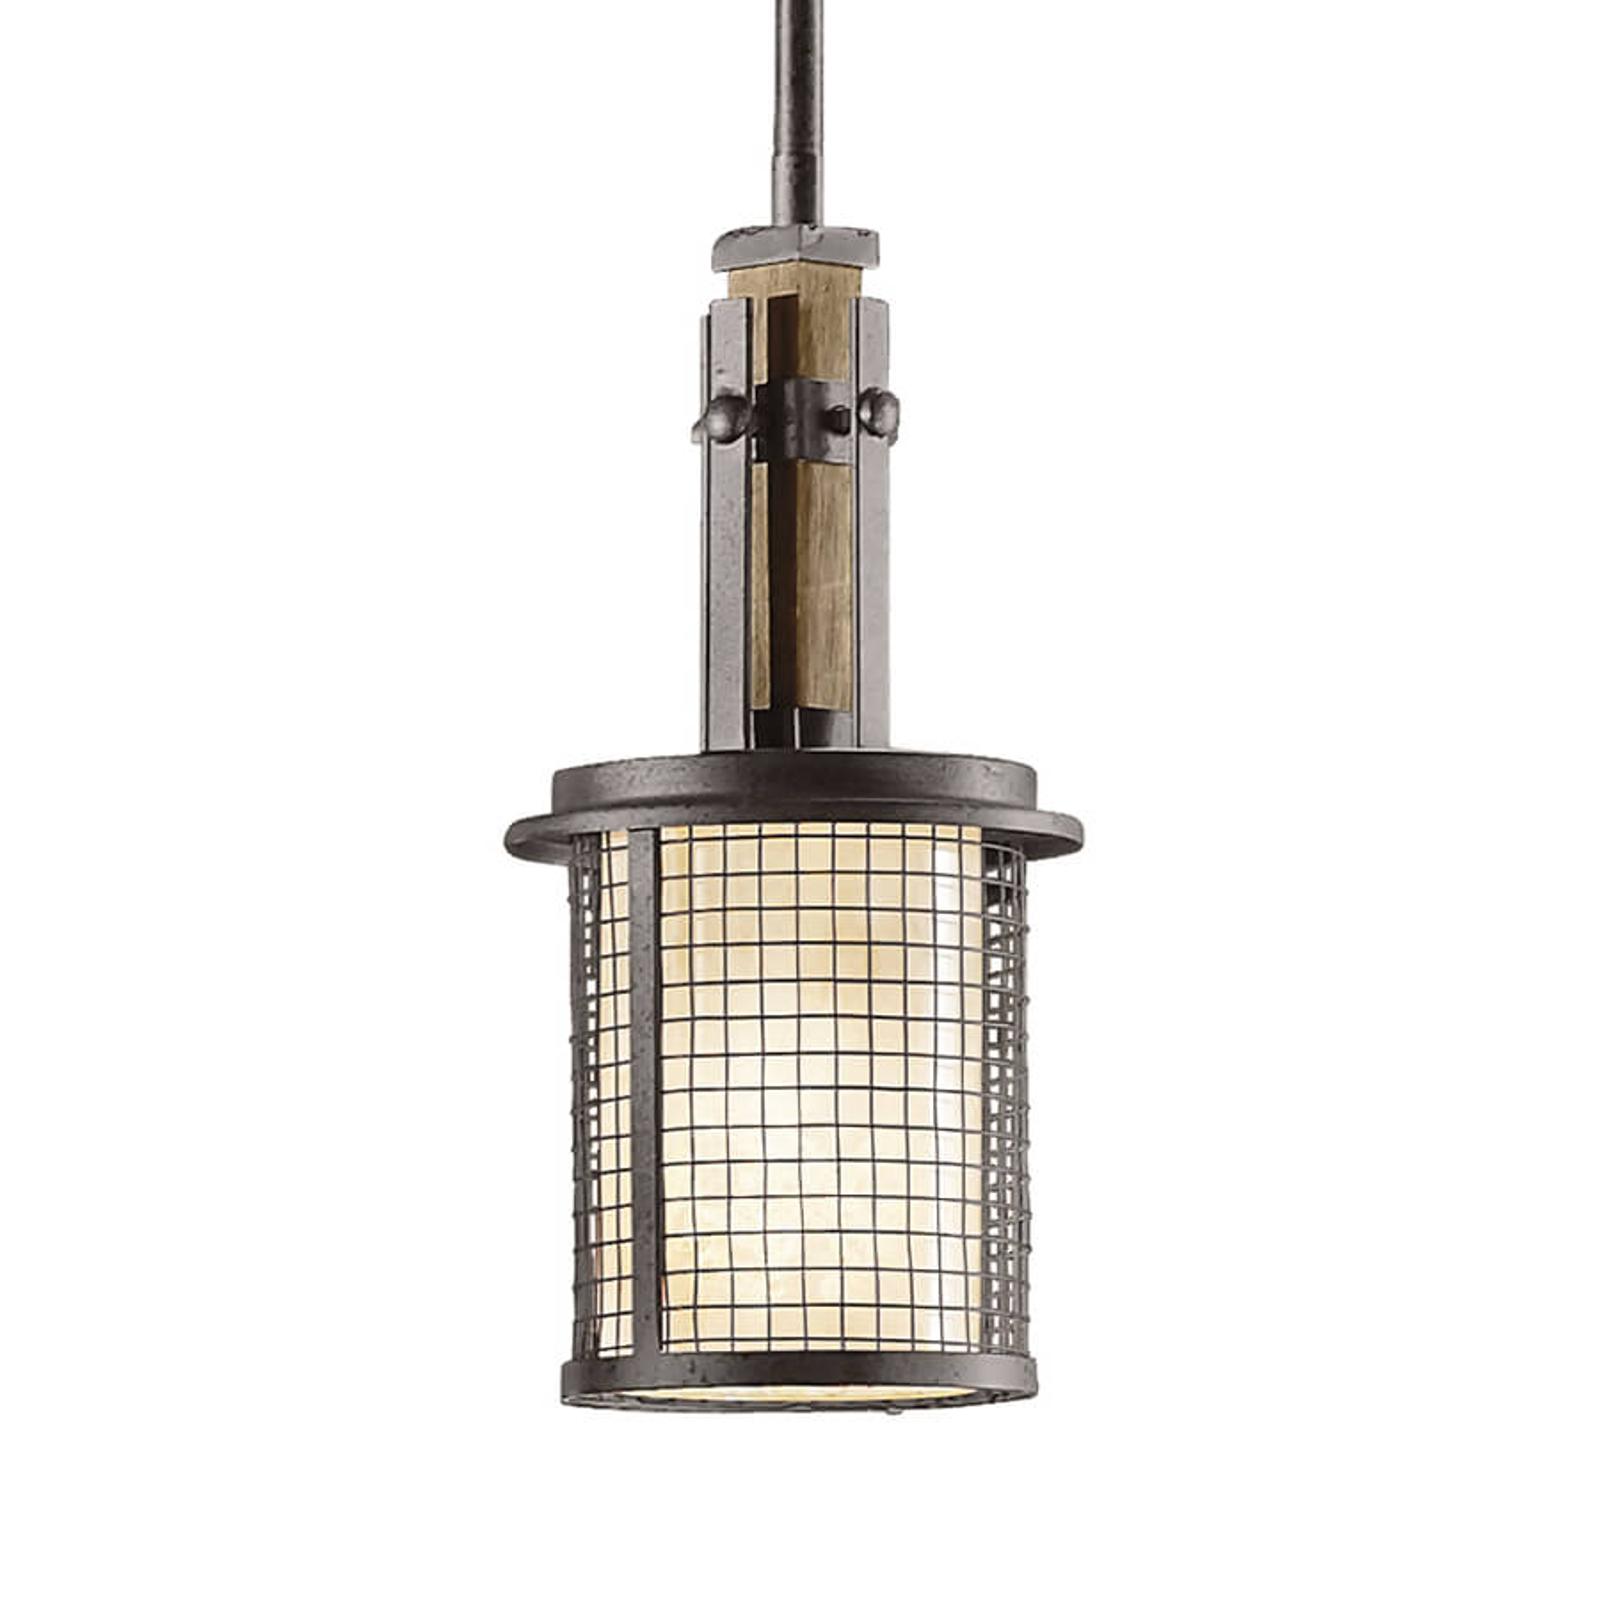 Hanglamp Ahrendale, klein